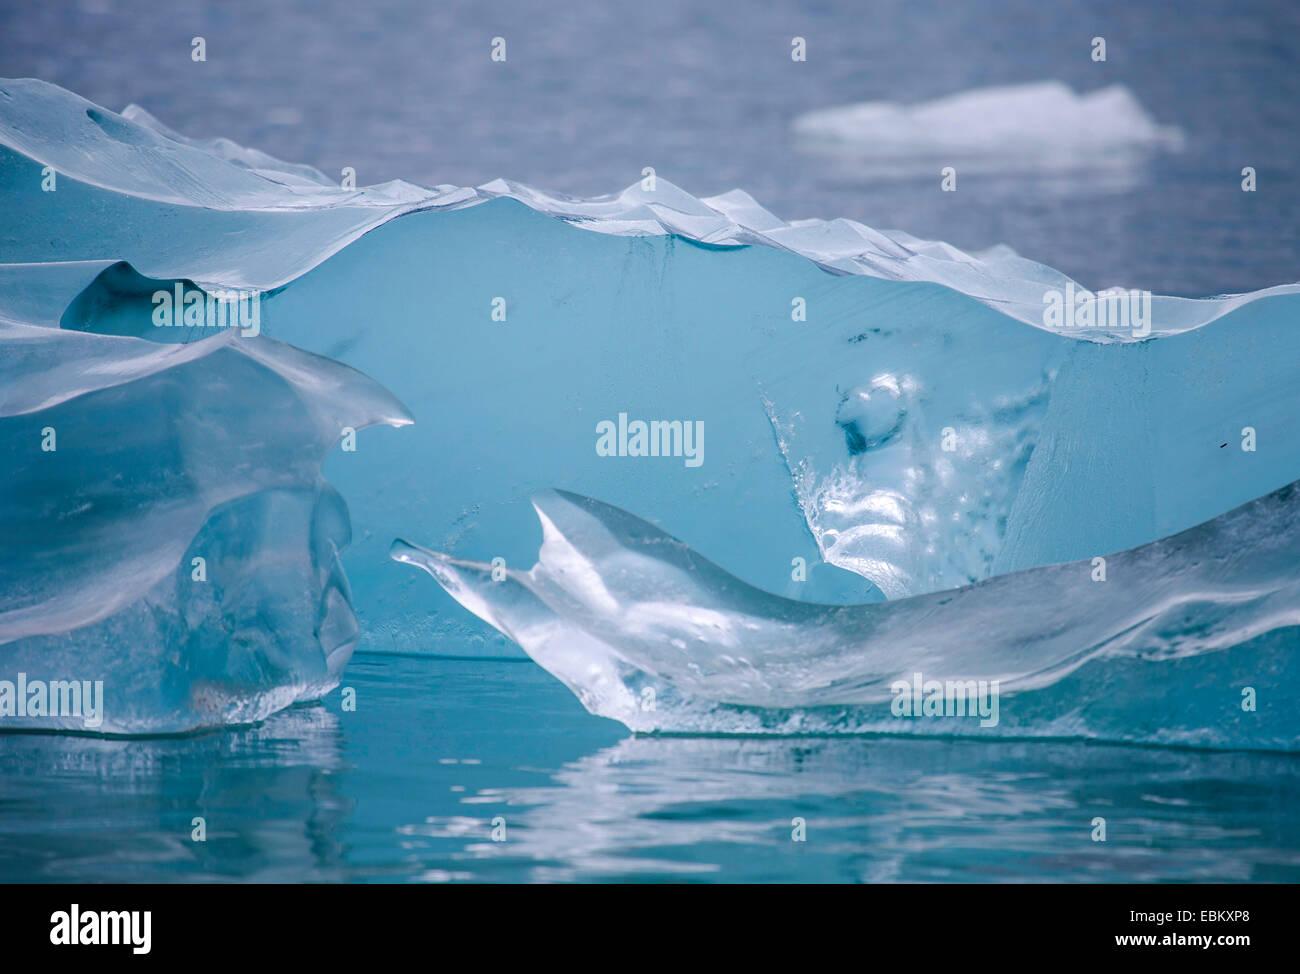 Hielo glaciar formas extrañas, Noruega, Svalbard, Hamiltonbukta Imagen De Stock